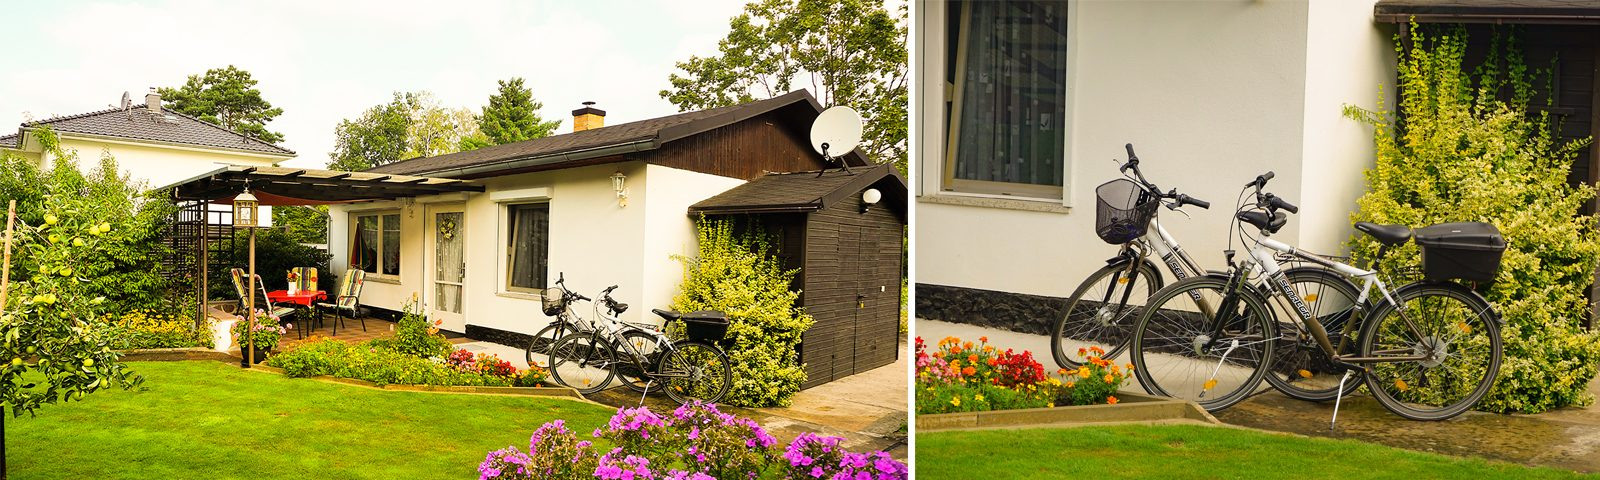 Ferienhaus der Familie Hinz | Wandlitz